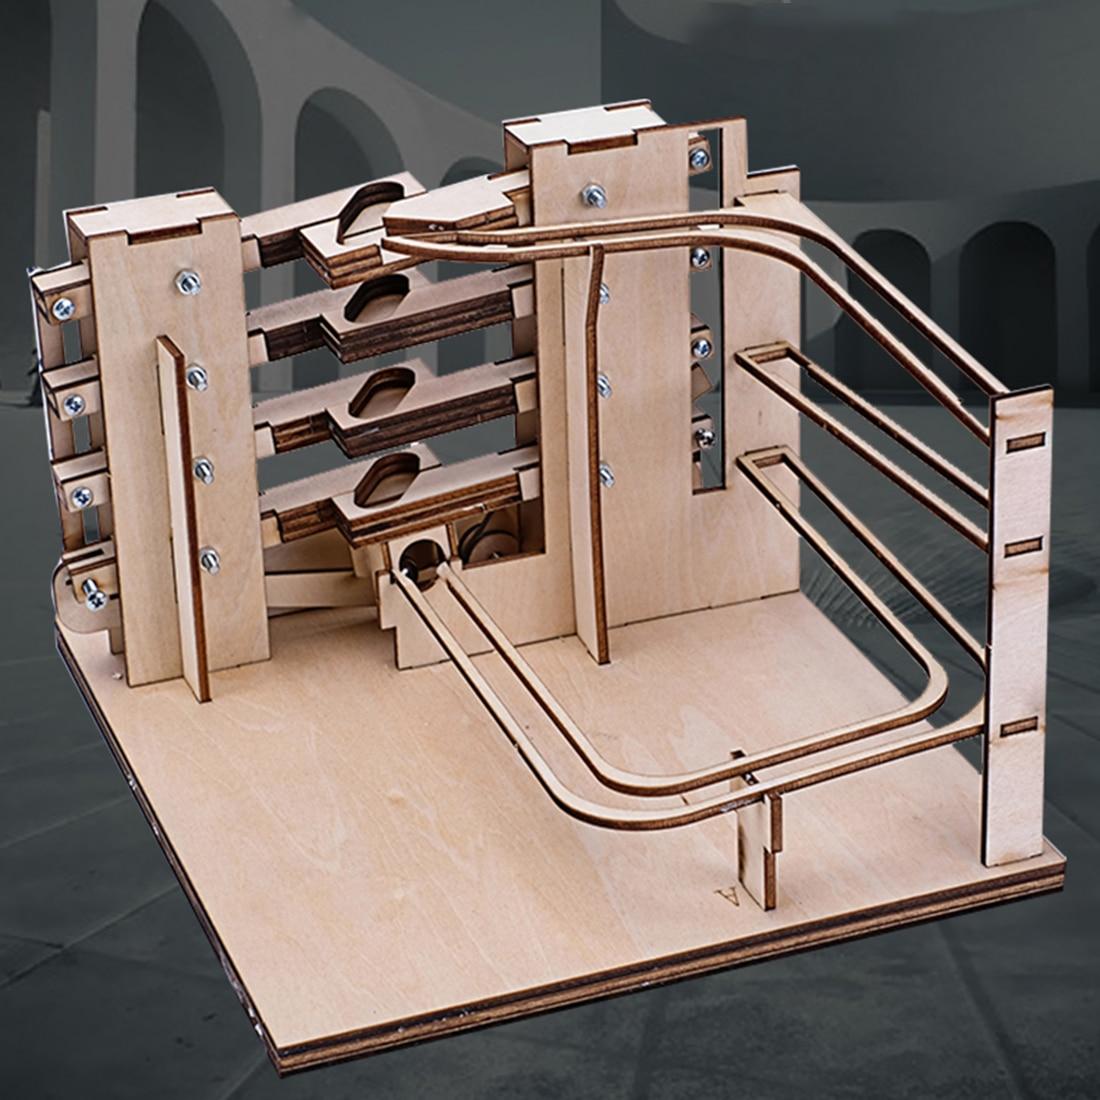 H923b5b178b9240a5808947110d88c42d8 - Robotime - DIY Models, DIY Miniature Houses, 3d Wooden Puzzle